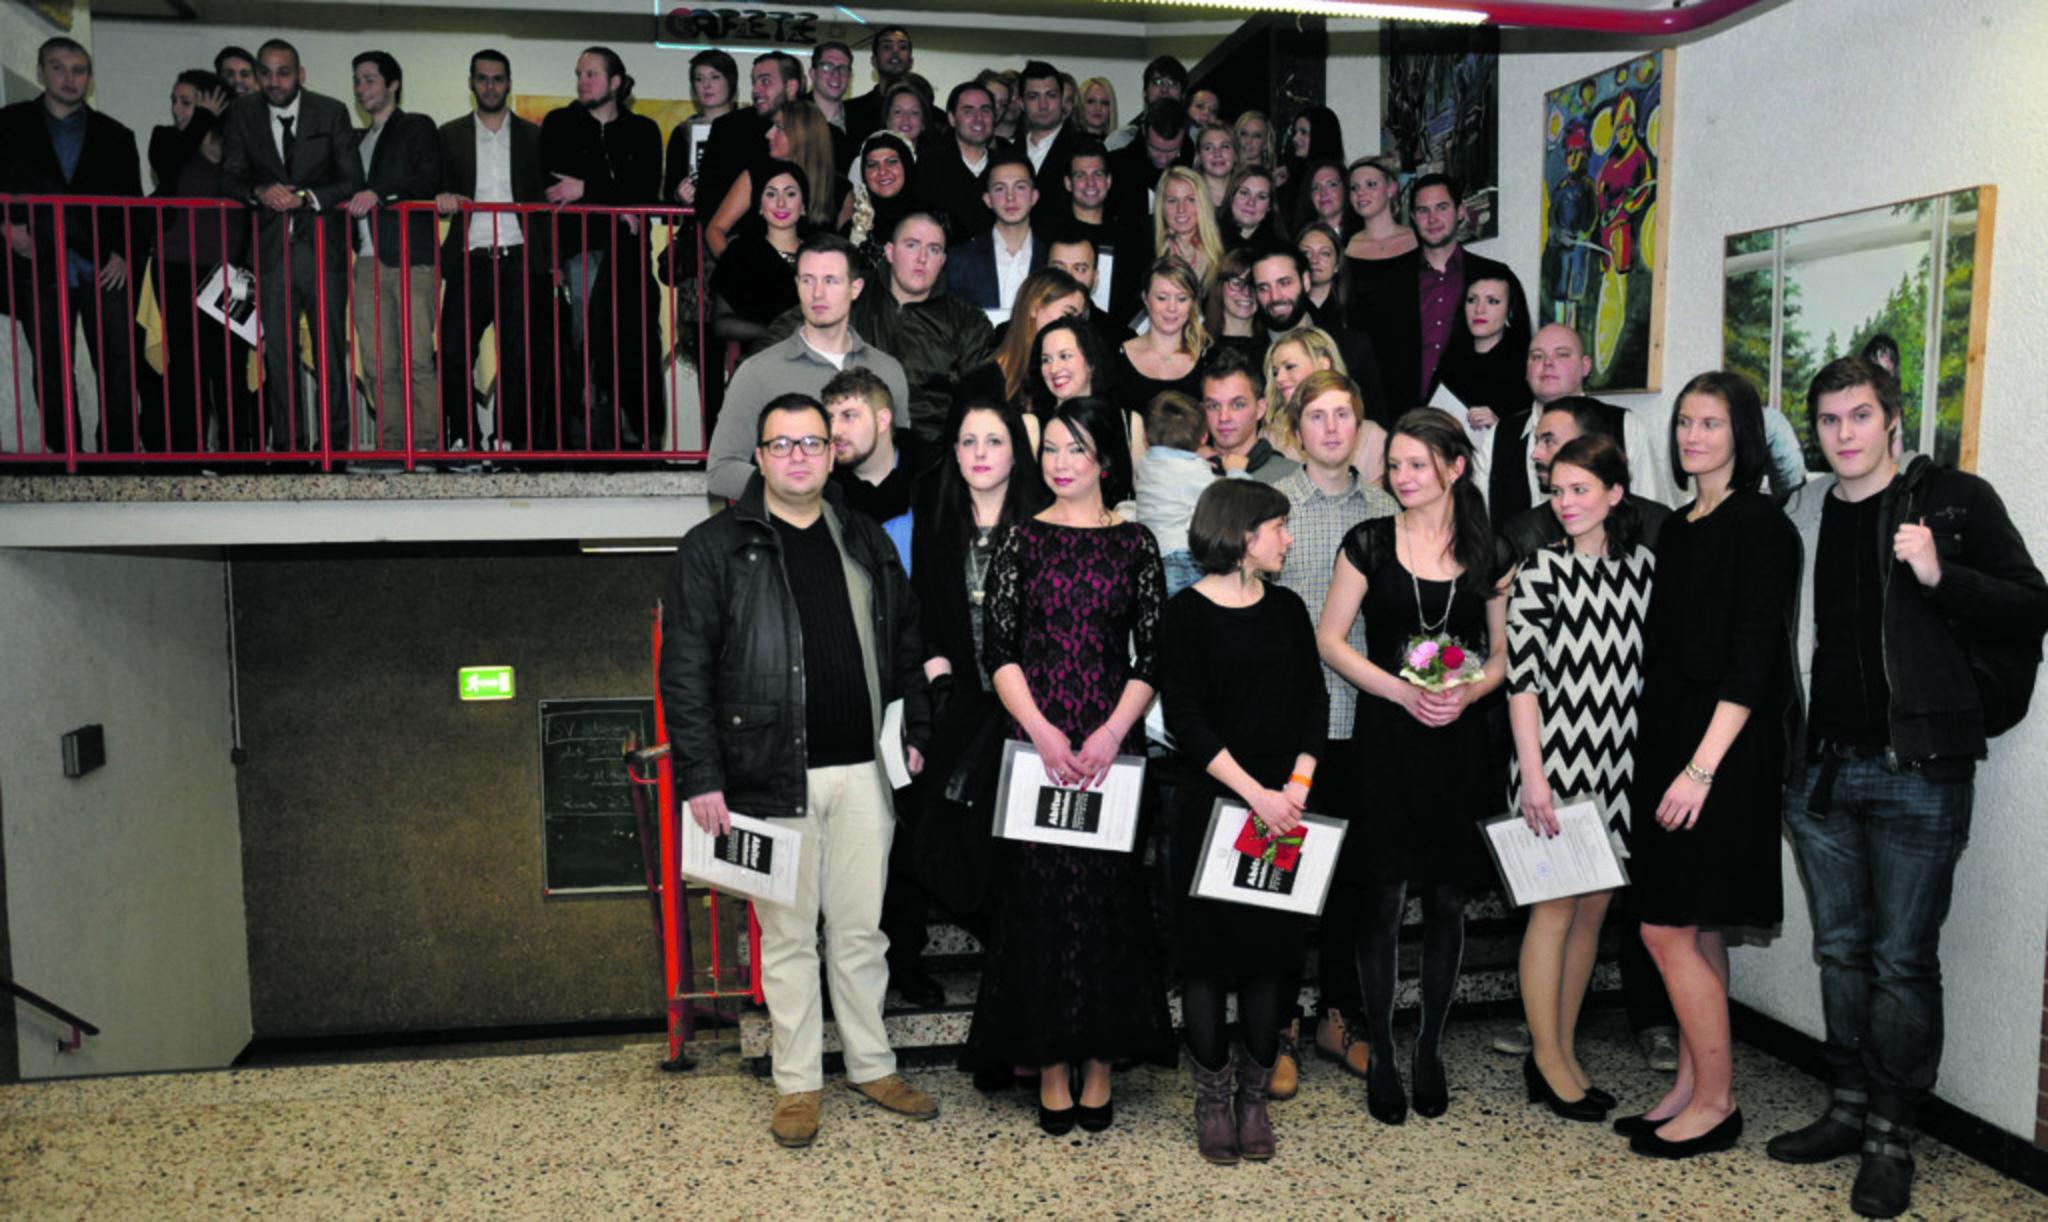 Abiturienten Feiern Am Westfalenkolleg Dortmund Dortmund City